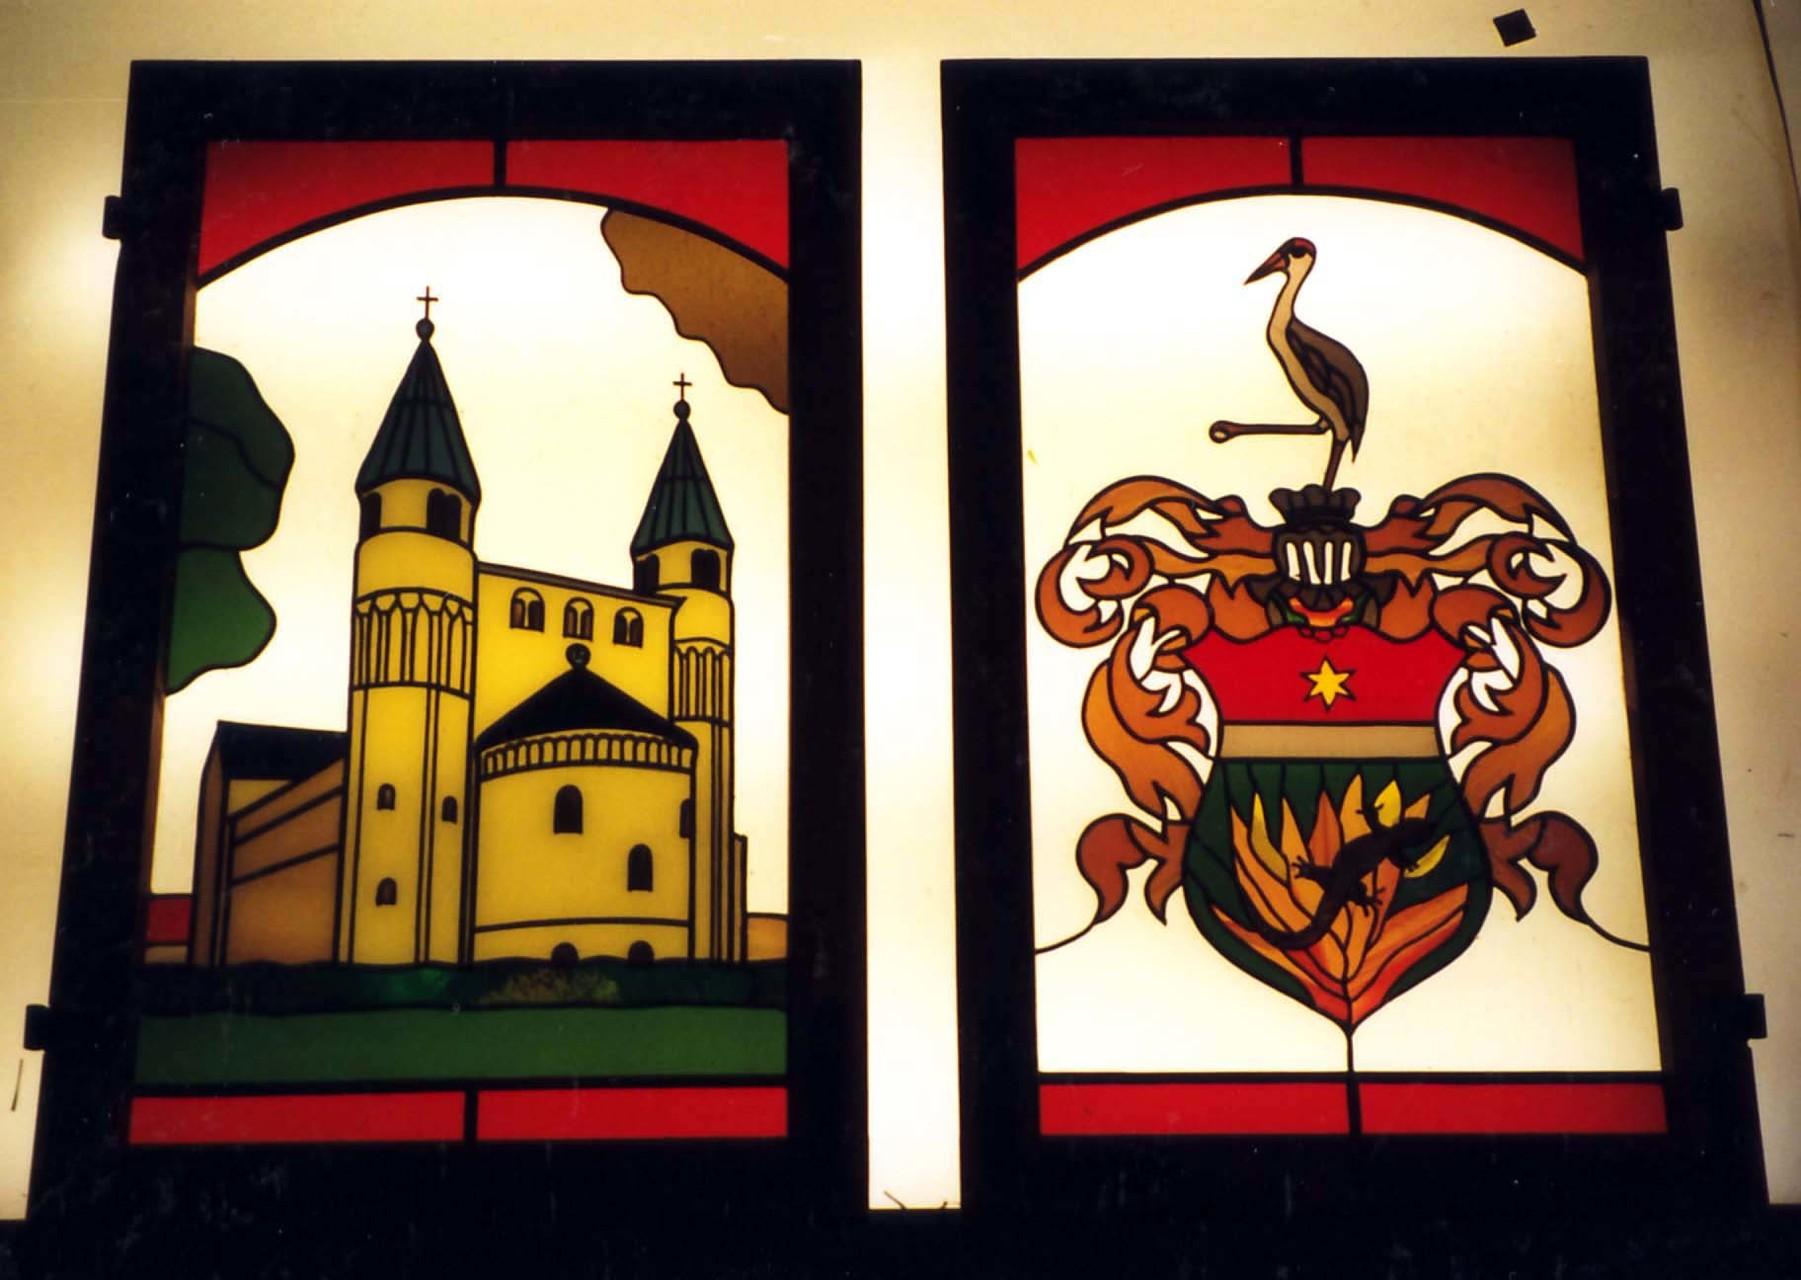 Stiftskirche St. Cyriacus Gernrode u. Familienwappen